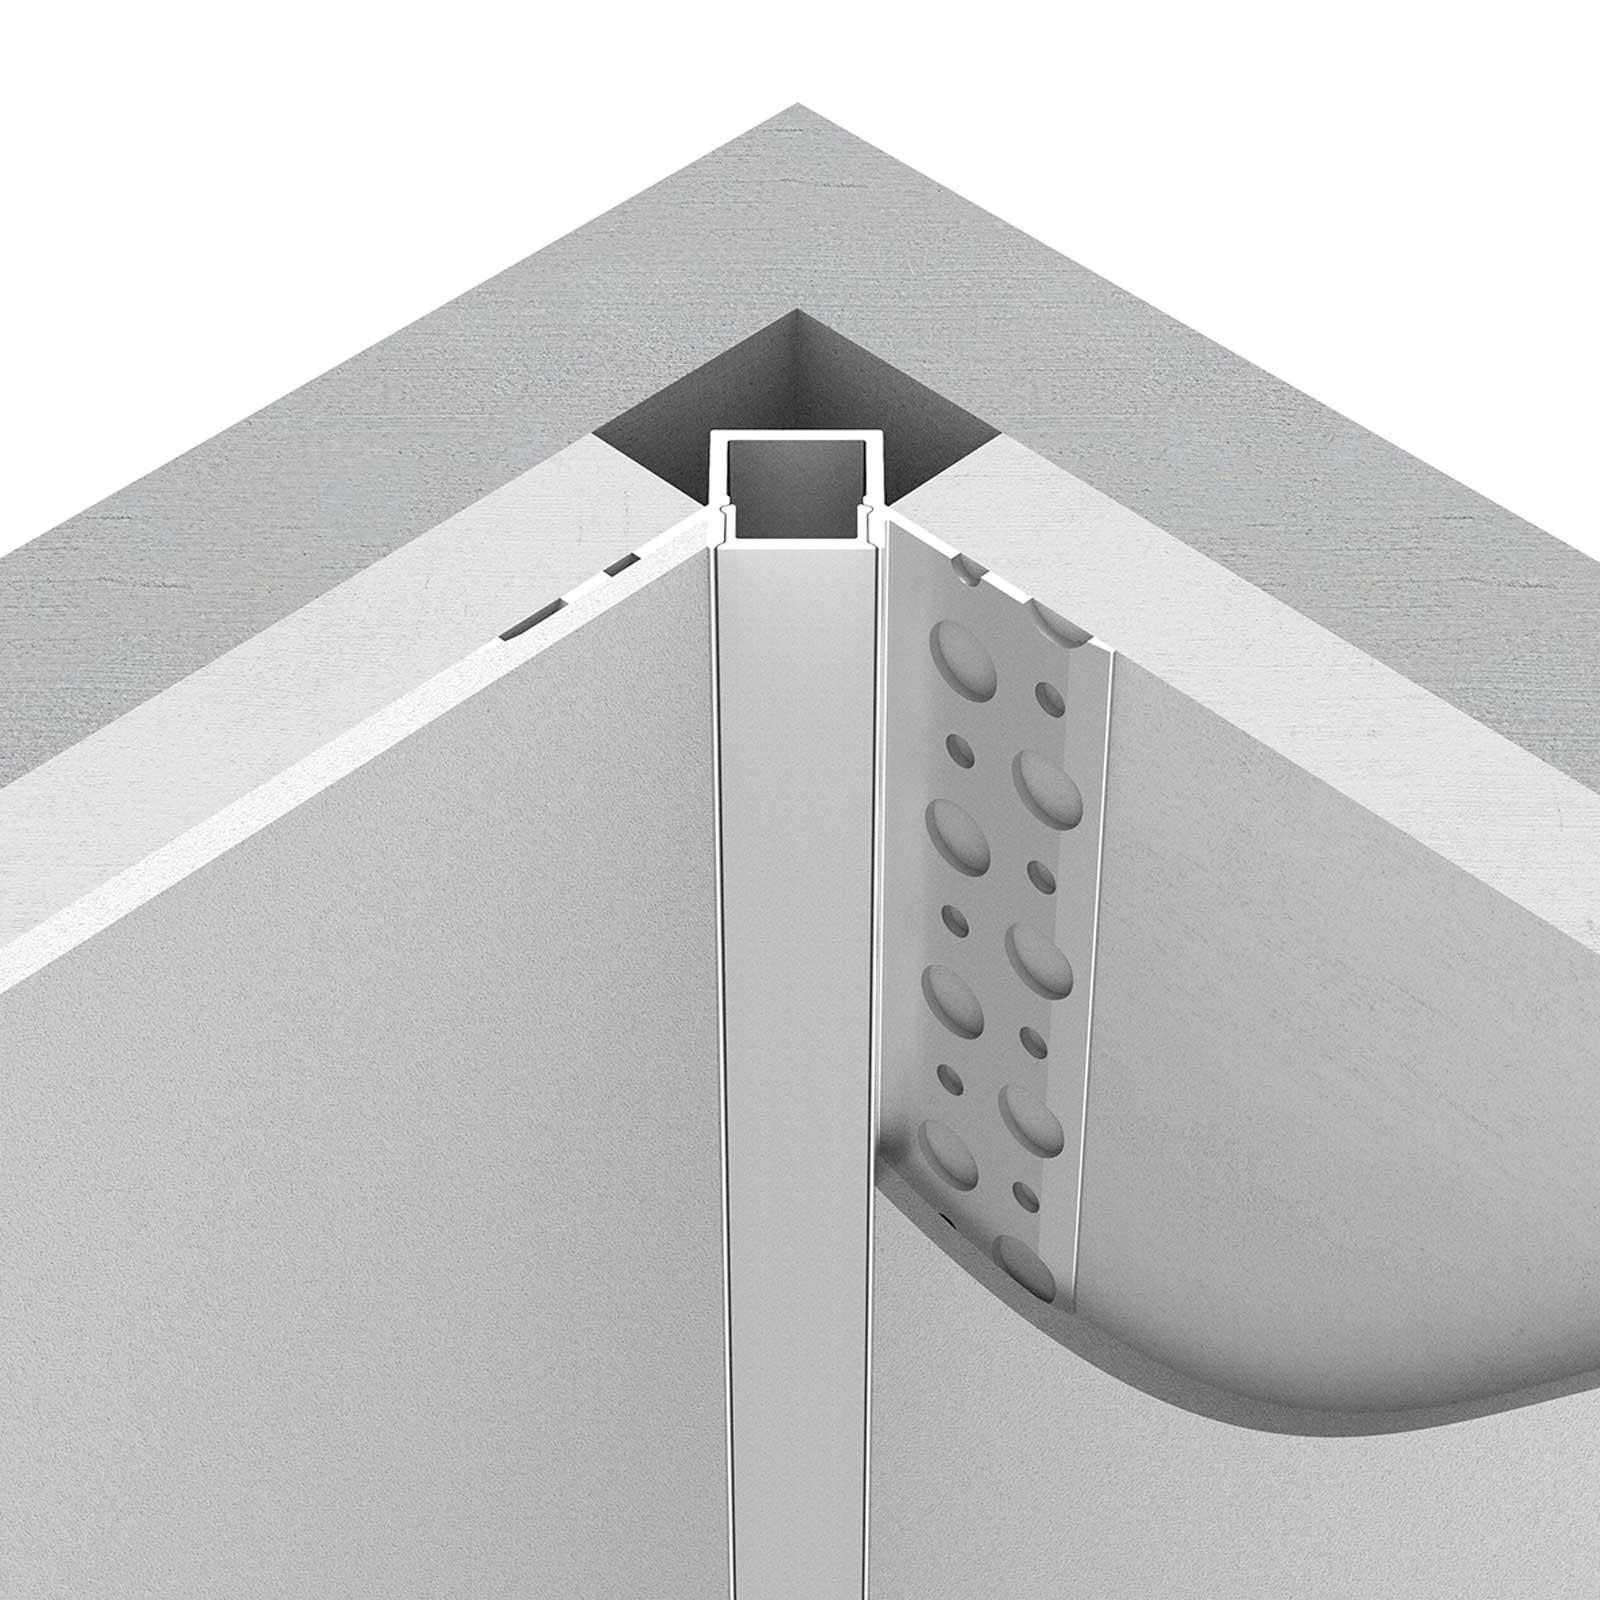 Montage 2 Meter LED Inneneck-Aluprofil CAMBRA (CB) für Trockenbau Rigipswand